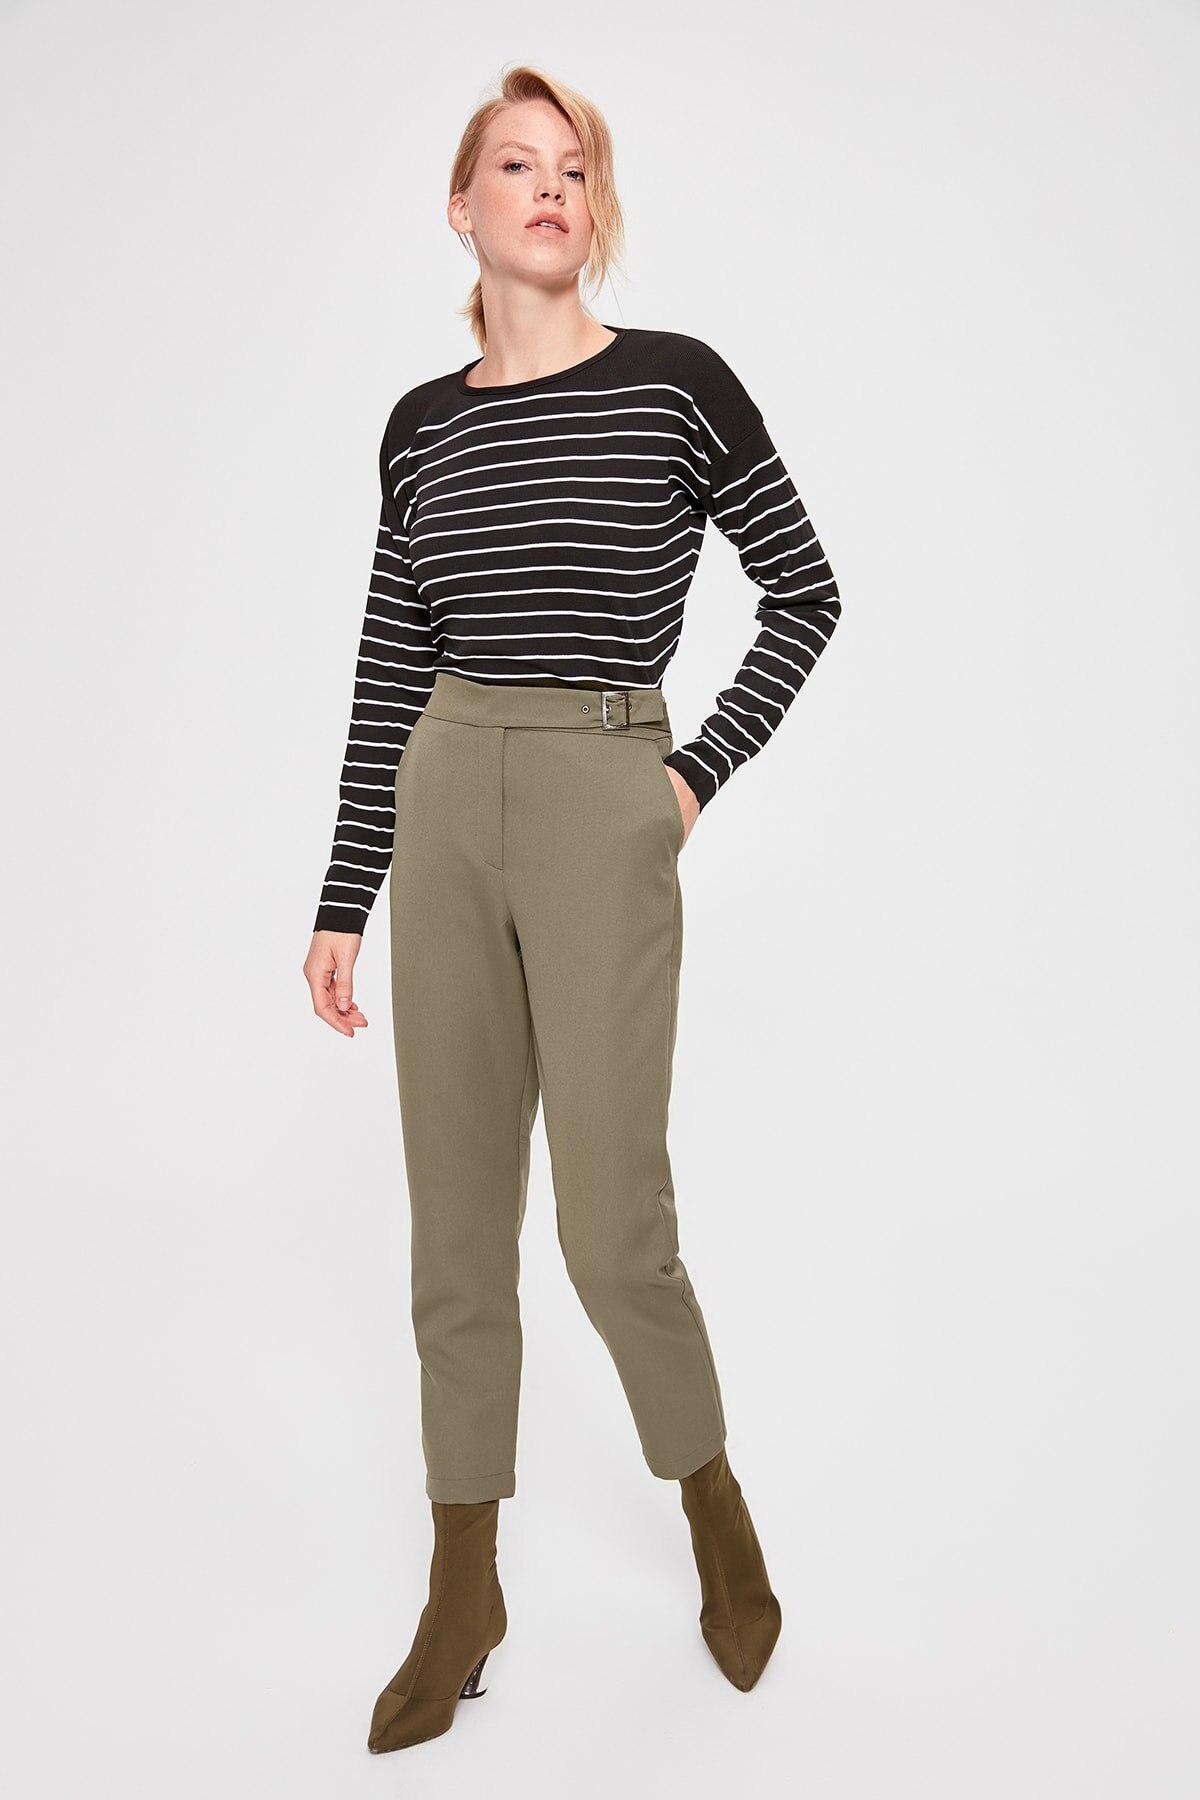 Trendyol Khaki Hand Arched Pants TWOAW20PL0266